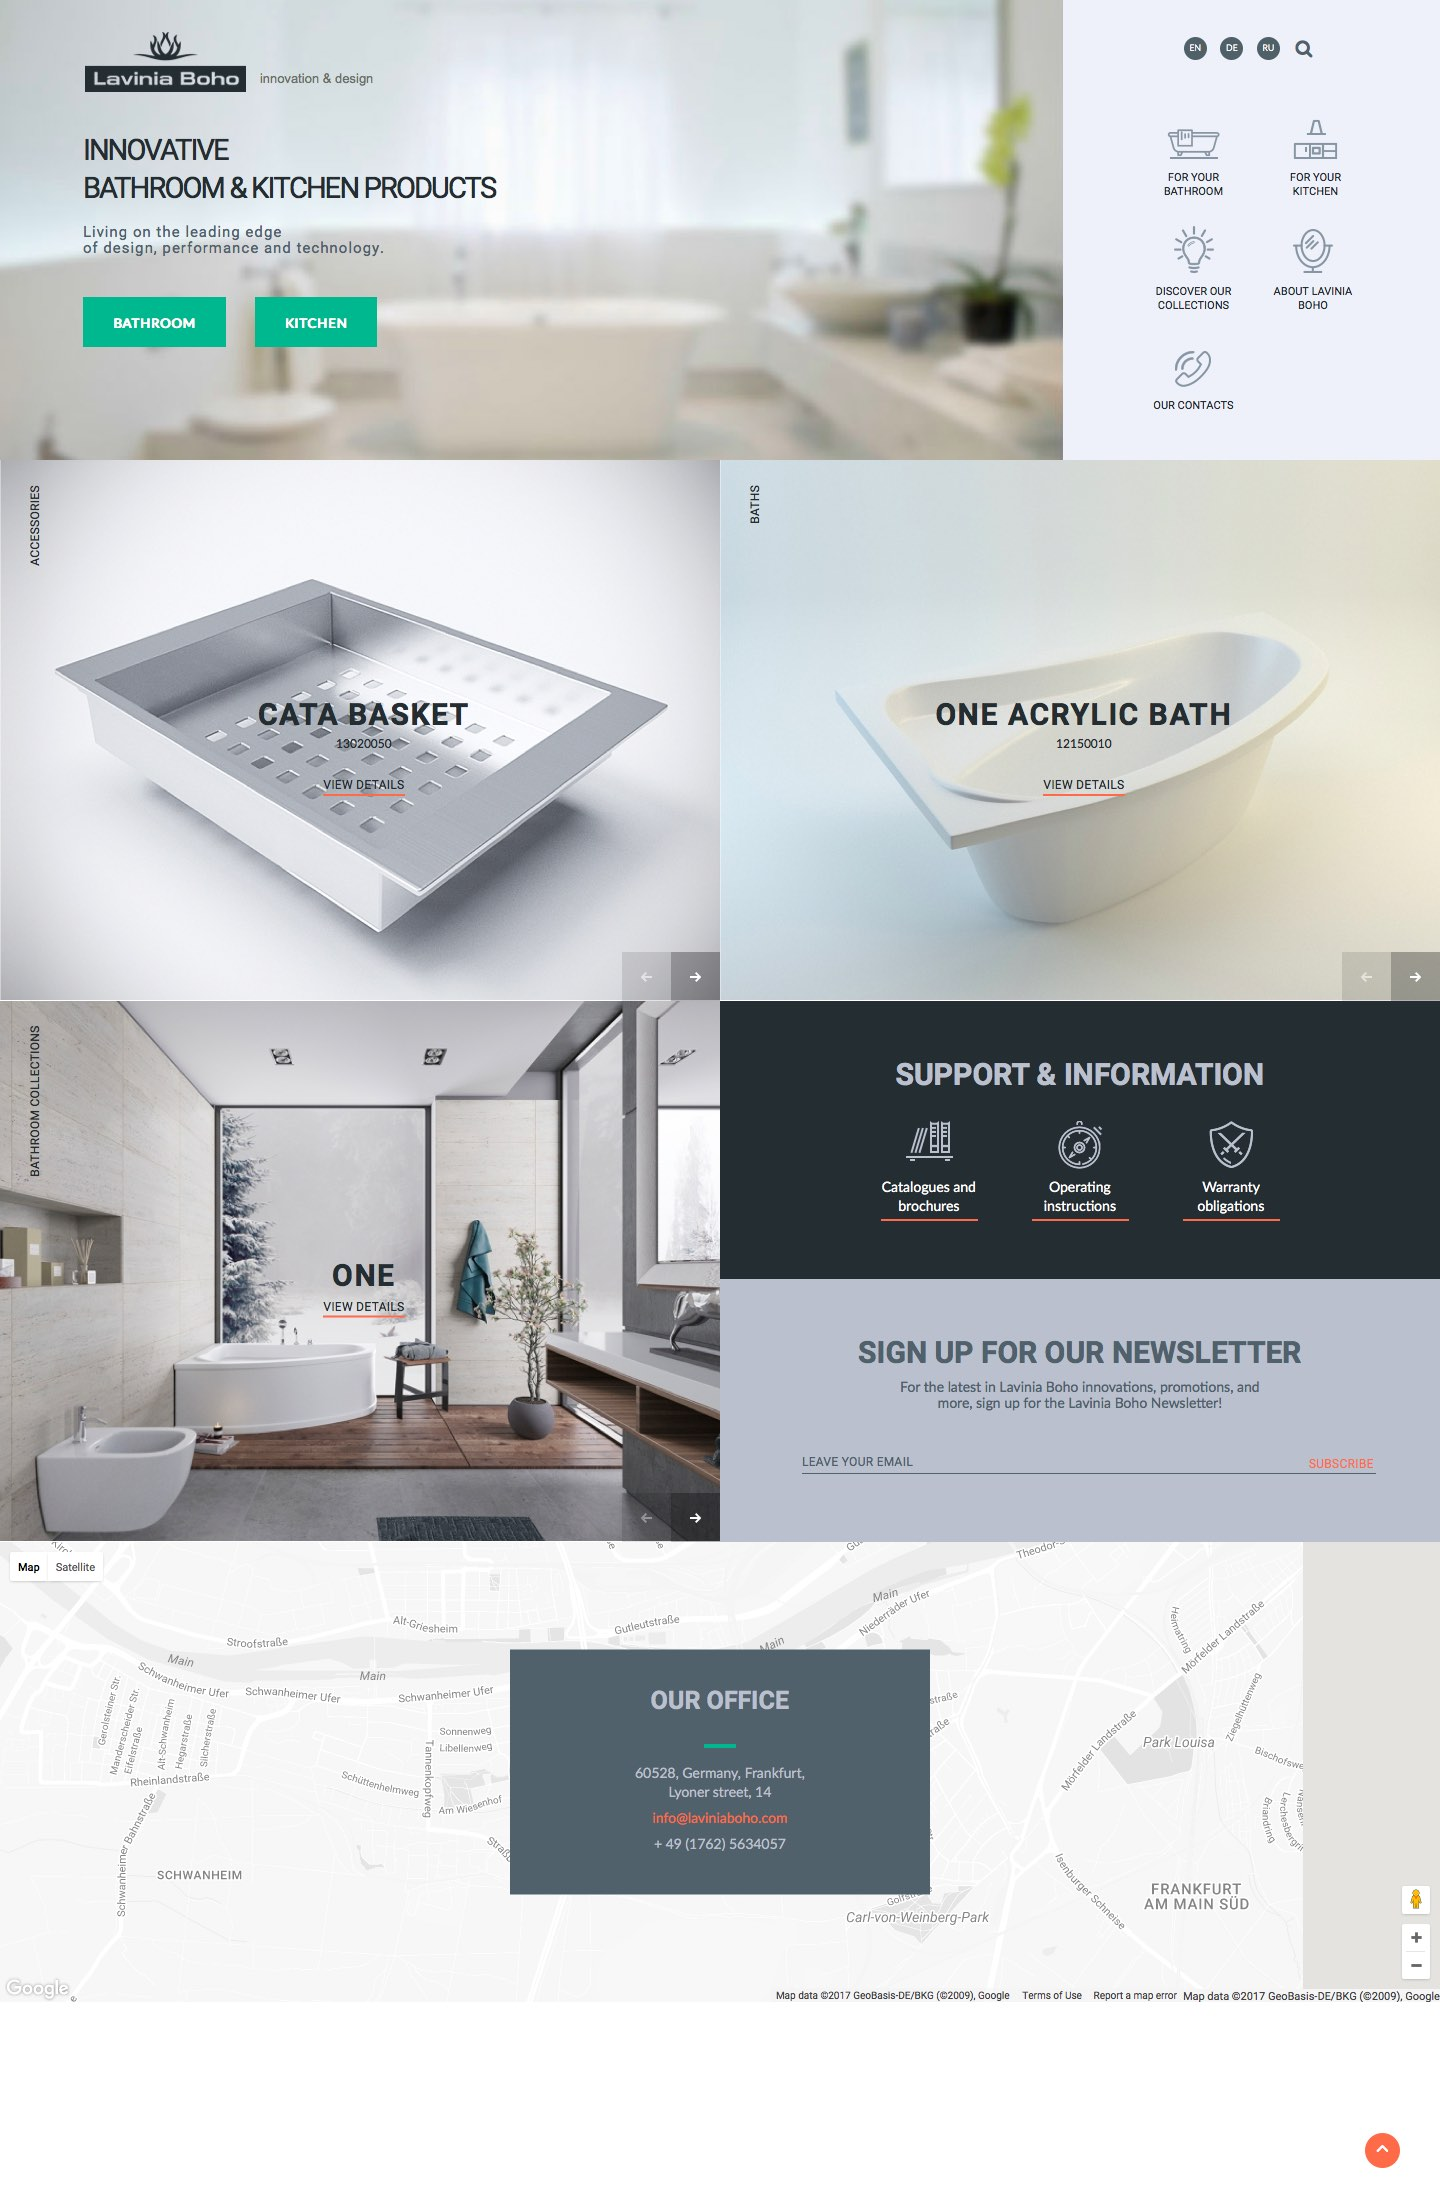 Сайт бренда Lavinia Boho на английском, русском и немецком